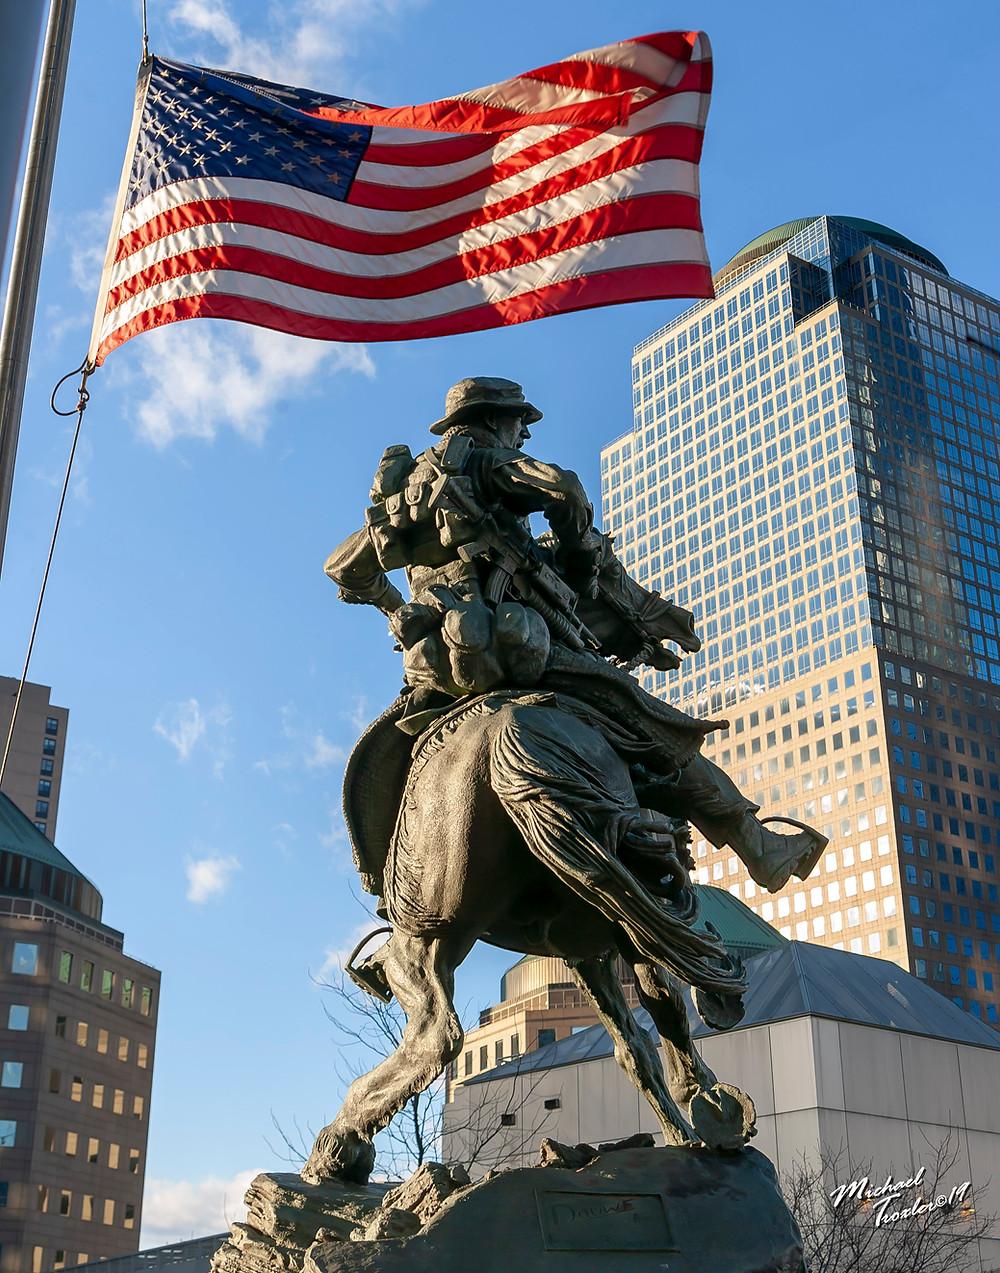 Americas Response Monument artist Douwe Blumberg photographer Michael Troxler